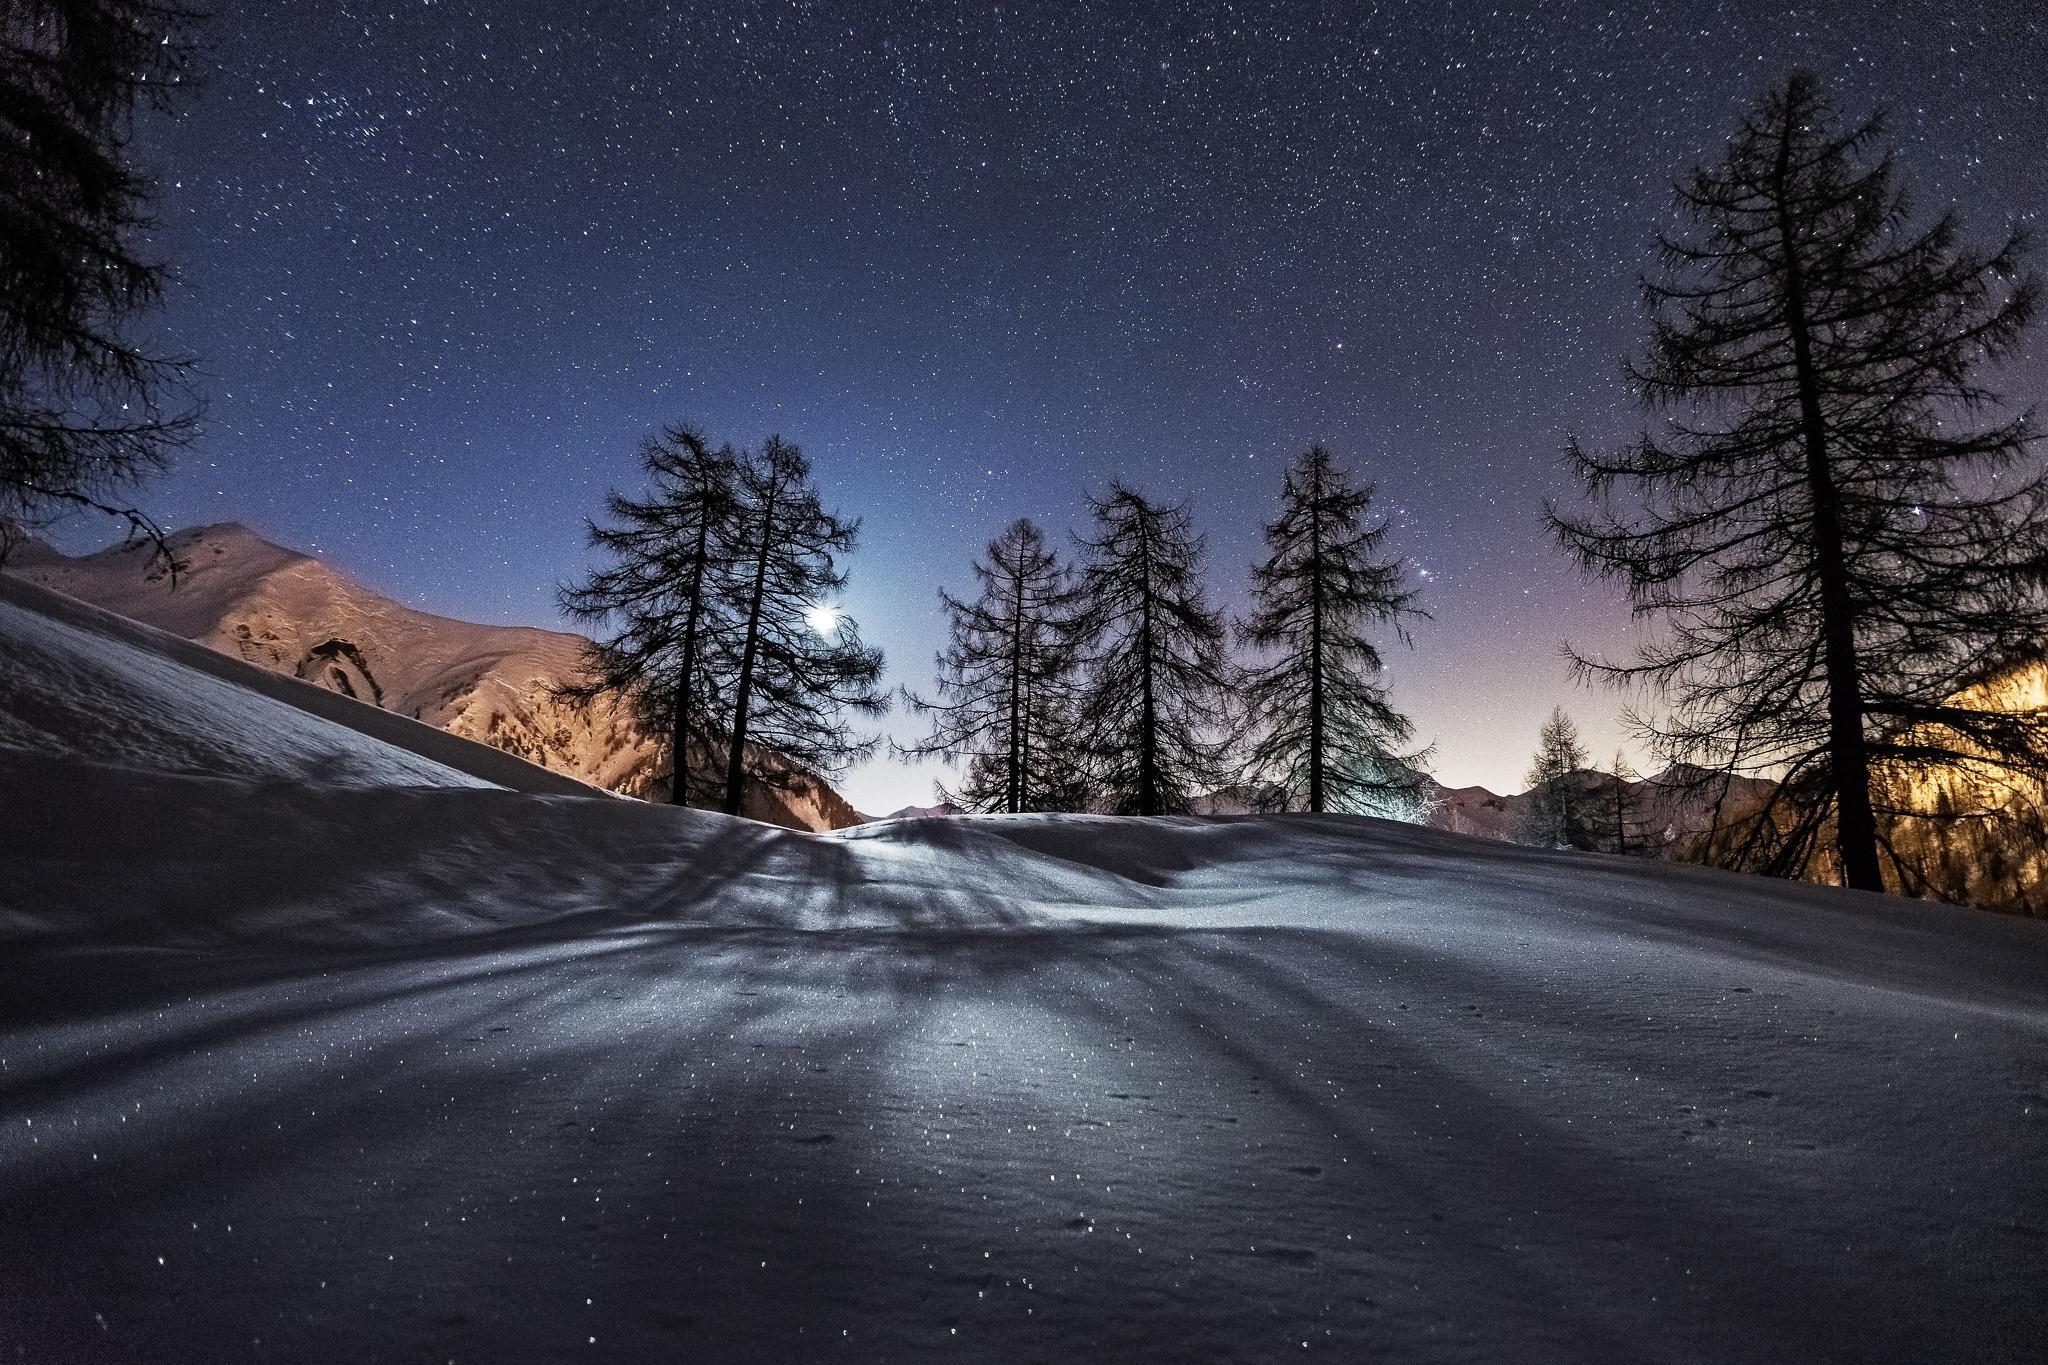 Trees night snow mountains hd nature 4k wallpapers - Night mountain wallpaper 4k ...